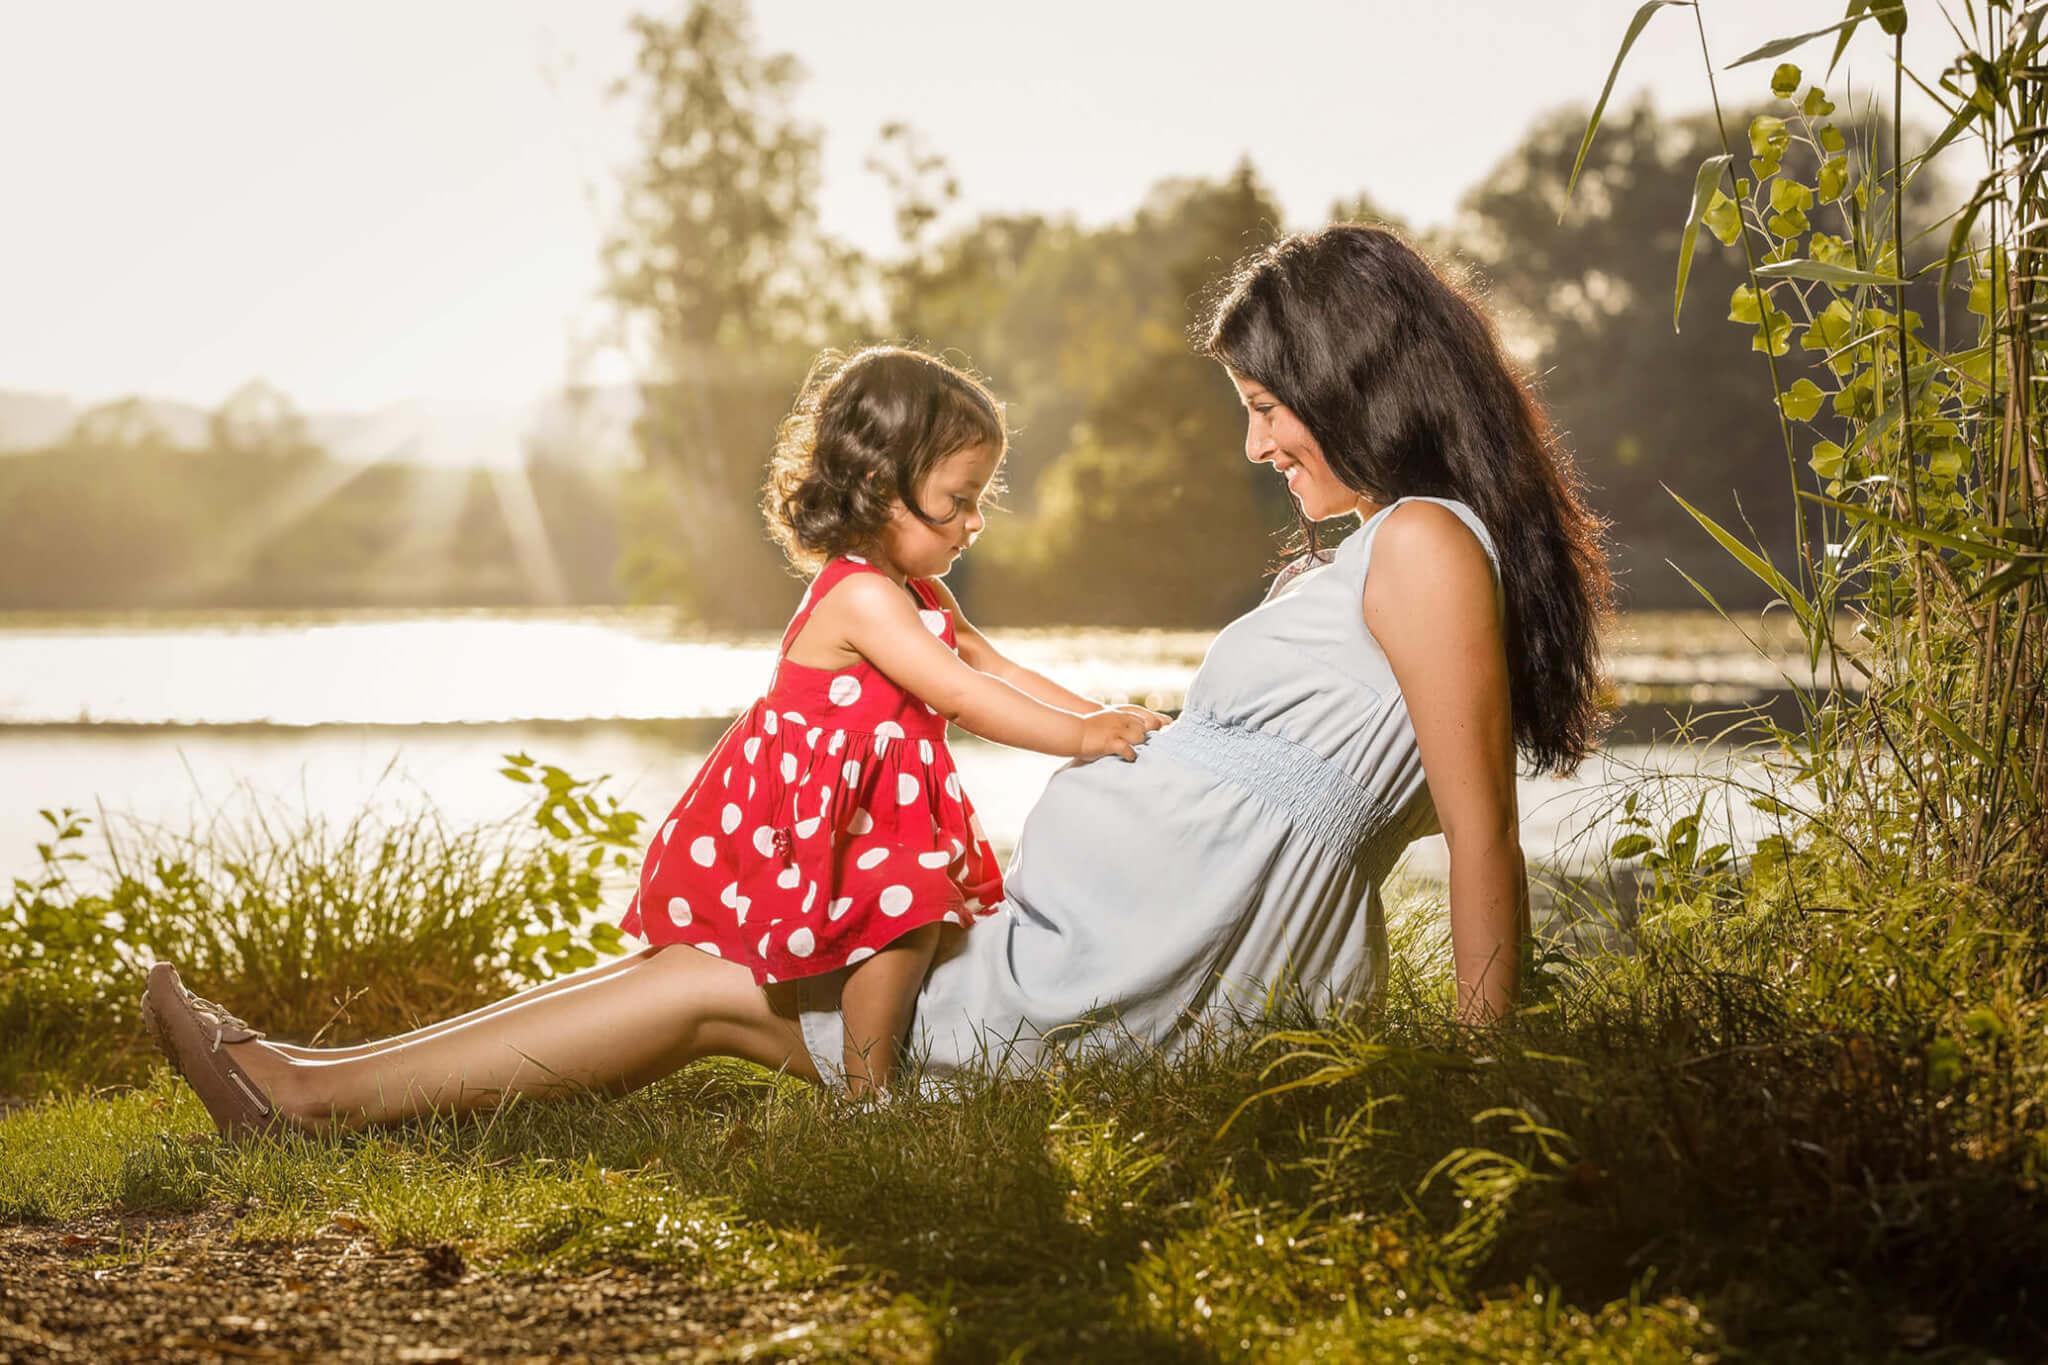 fotoshooting-cpfotografie-mama-mit-kind Baby & Mam Fotoshooting Blog Photography